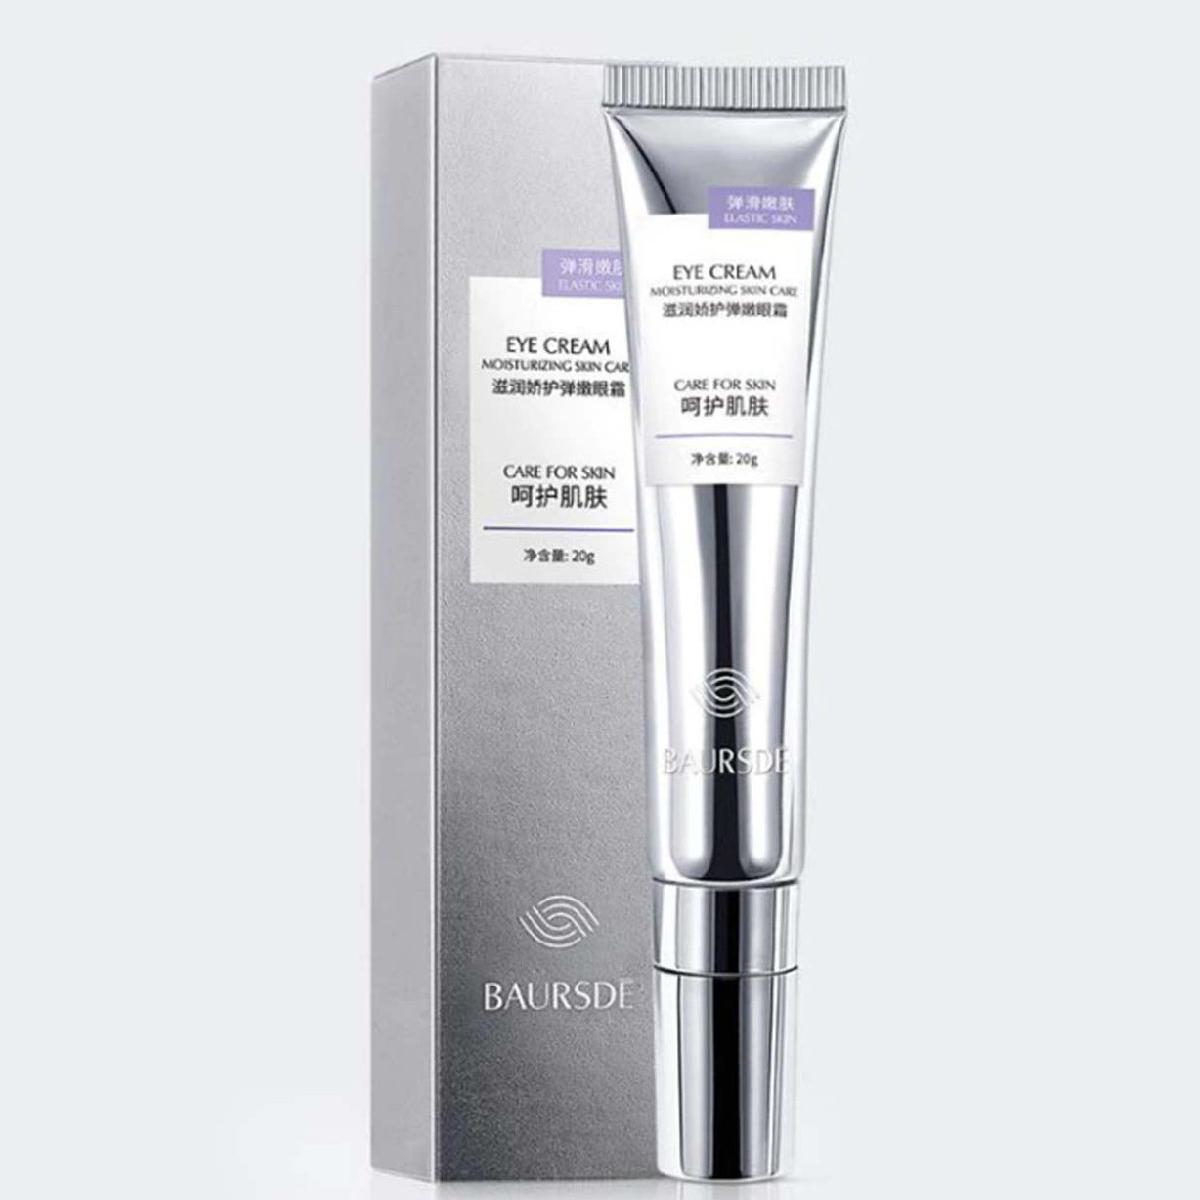 BAURSDE Eye Cream Moisturizing & Dark Circle Skin Care 20g-BS36914